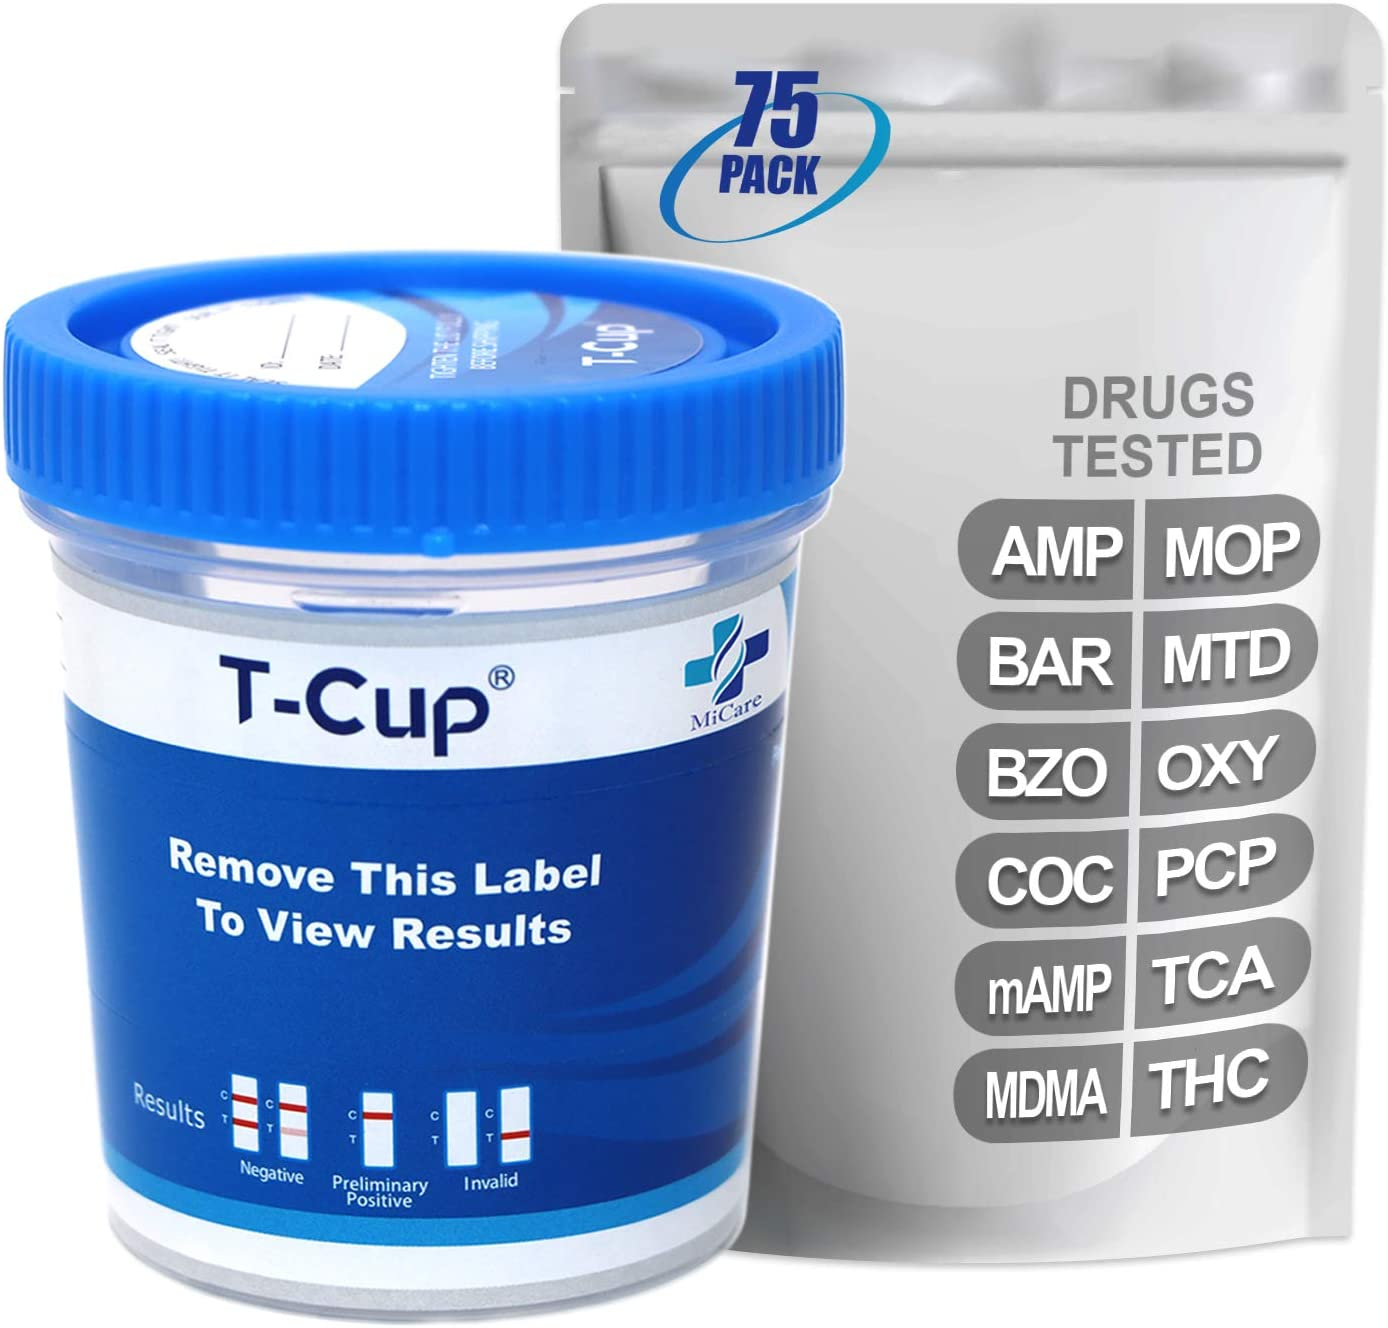 MiCare 75pk - 12-Panel 未使用品 Multi Drug Test mA 爆買いセール BZO COC Cup AMP BAR